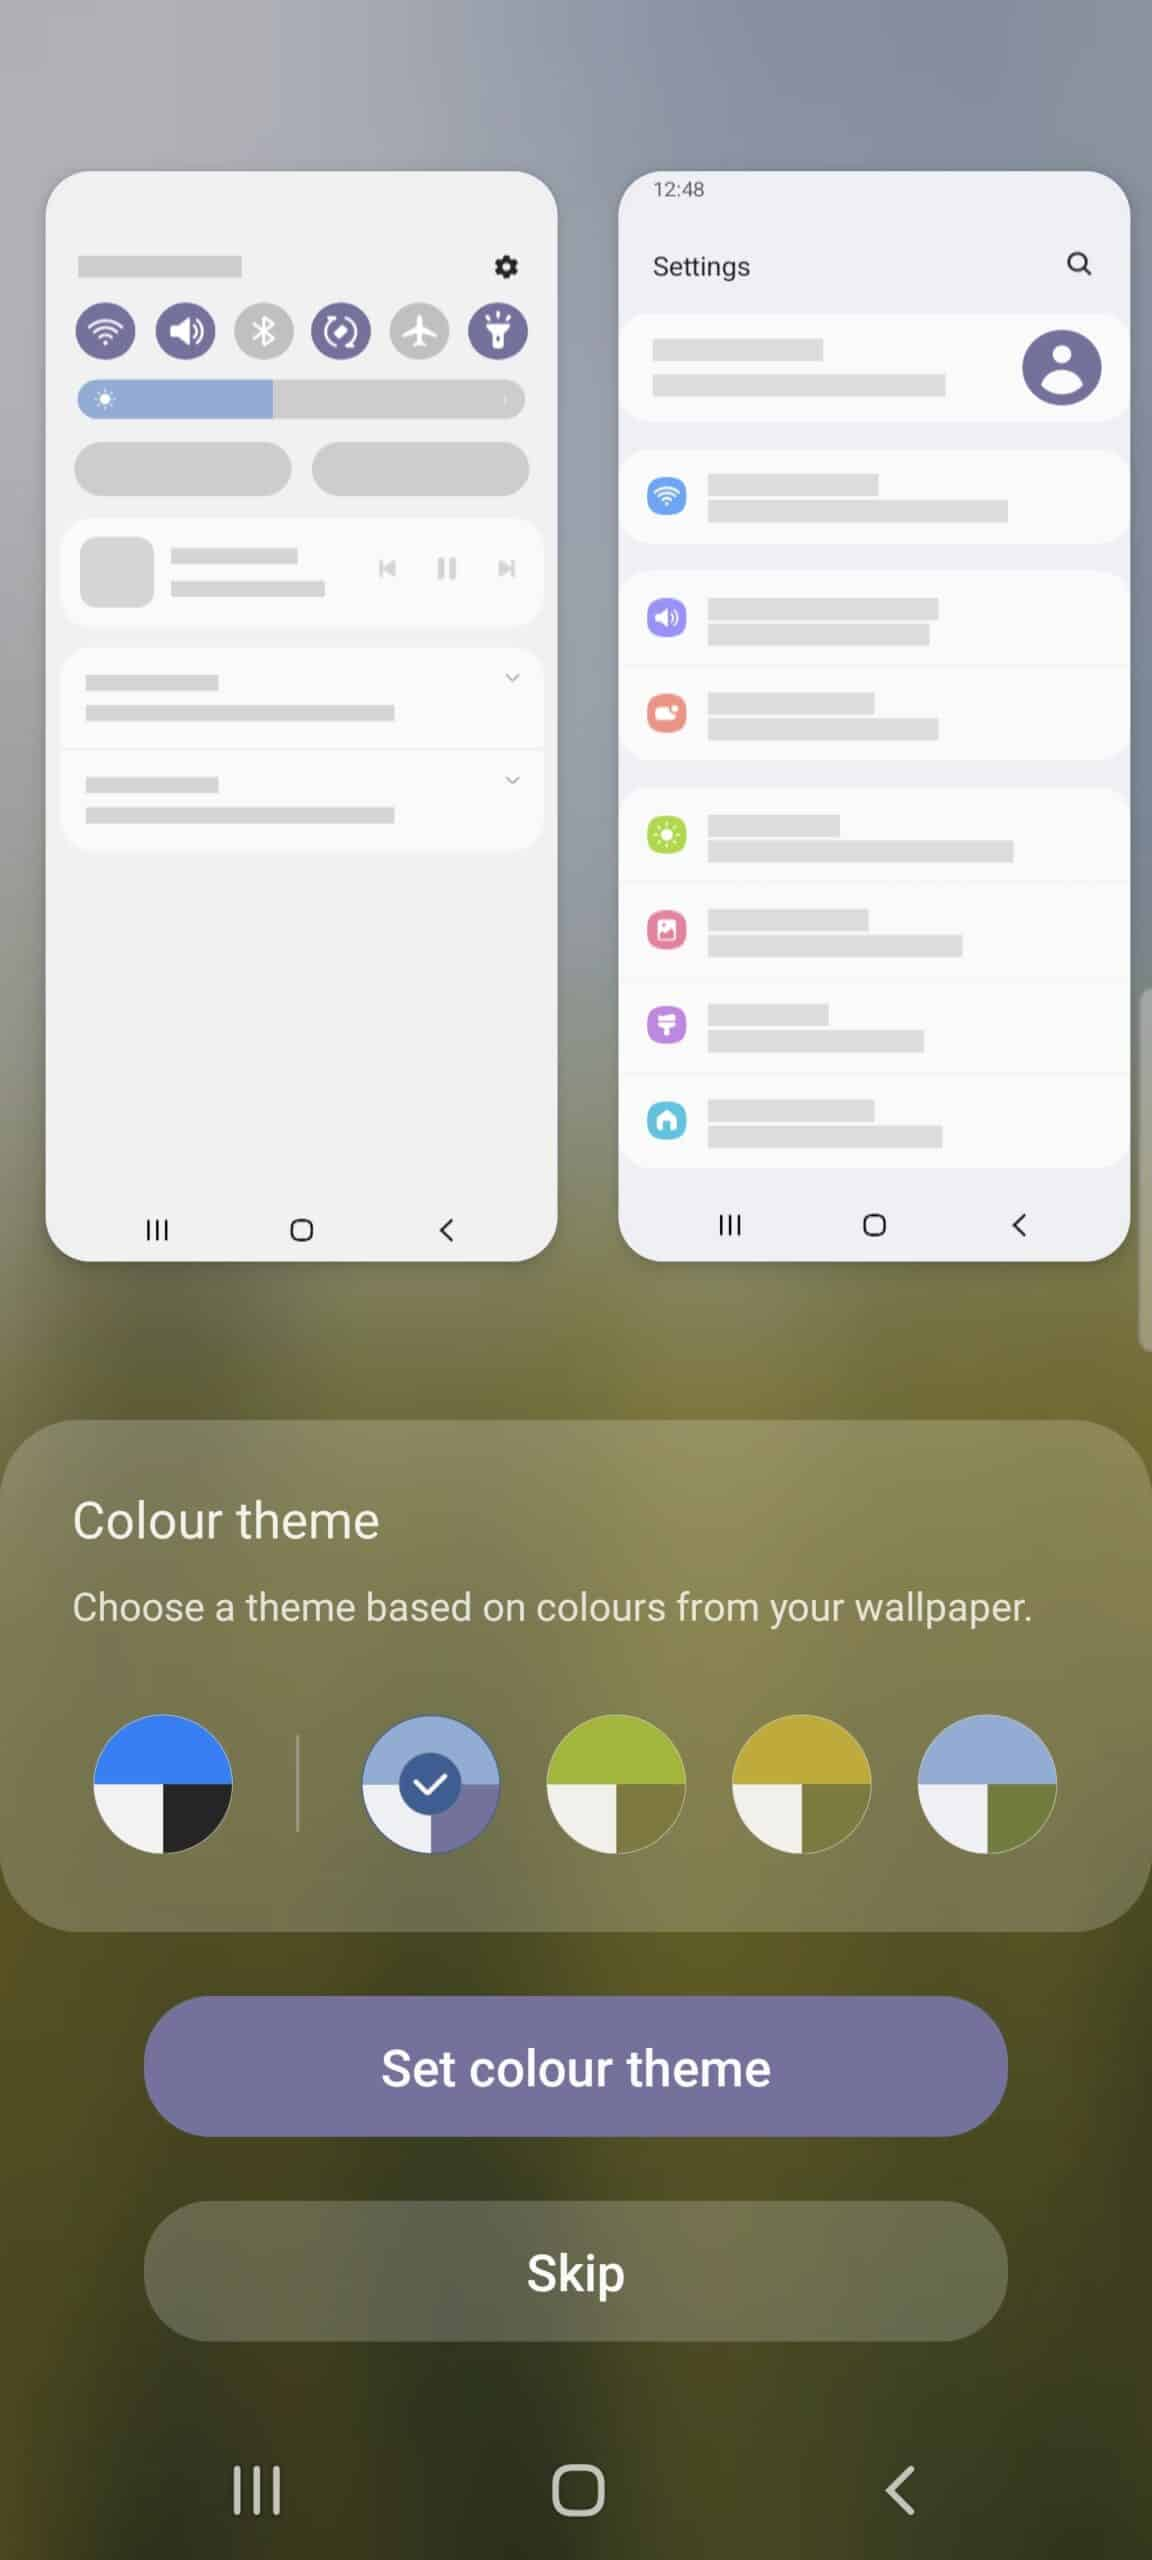 Samsung Galaxy S21 one UI 4 beta 2 dynamic coloring